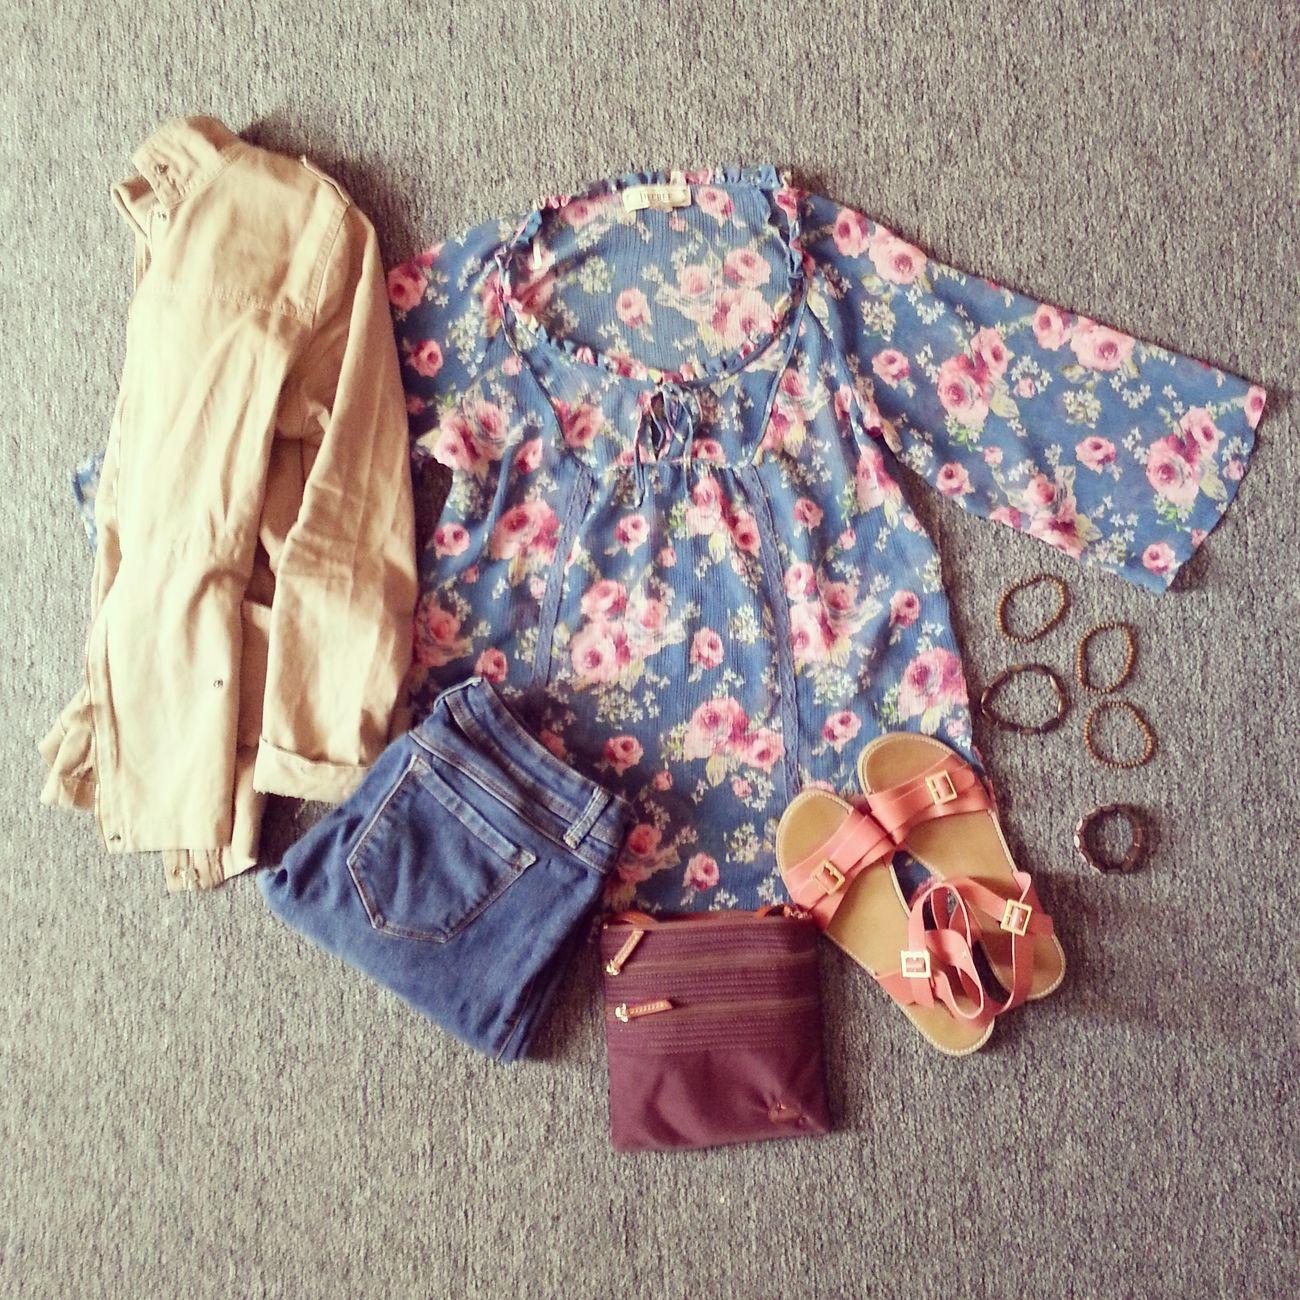 #OOTD - forever21 sandles, beige jacket, bracelets, flower shirt, purple dooney and bourke, and blue jeans ♥